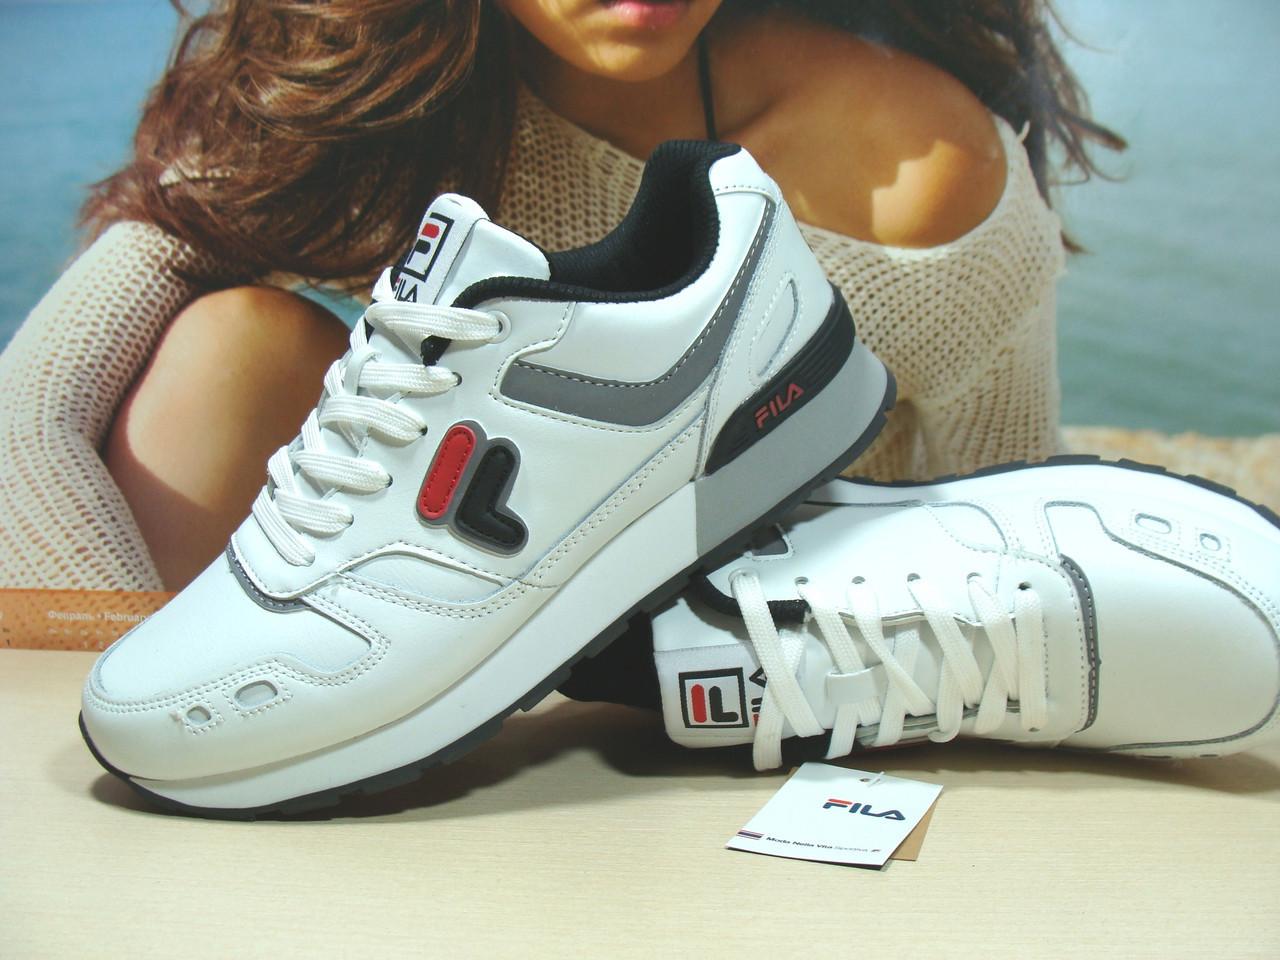 Мужские кроссовки Fila RJ STAR 85 (реплика) белые 43 р., фото 1